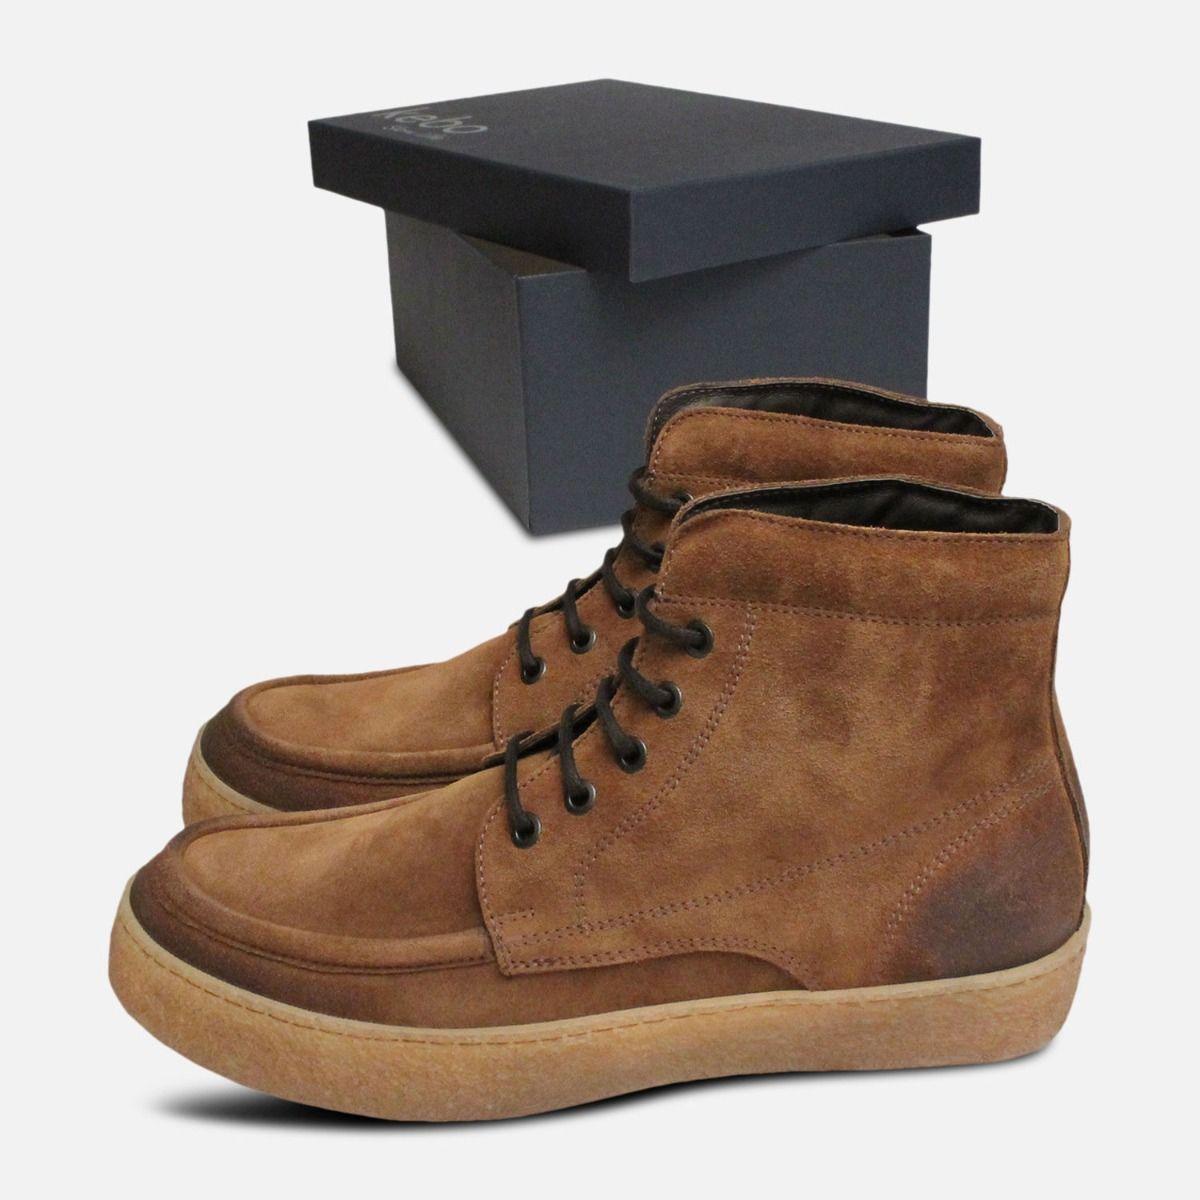 Tobacco Waxy Suede Designer Italian Cup Sole Boots